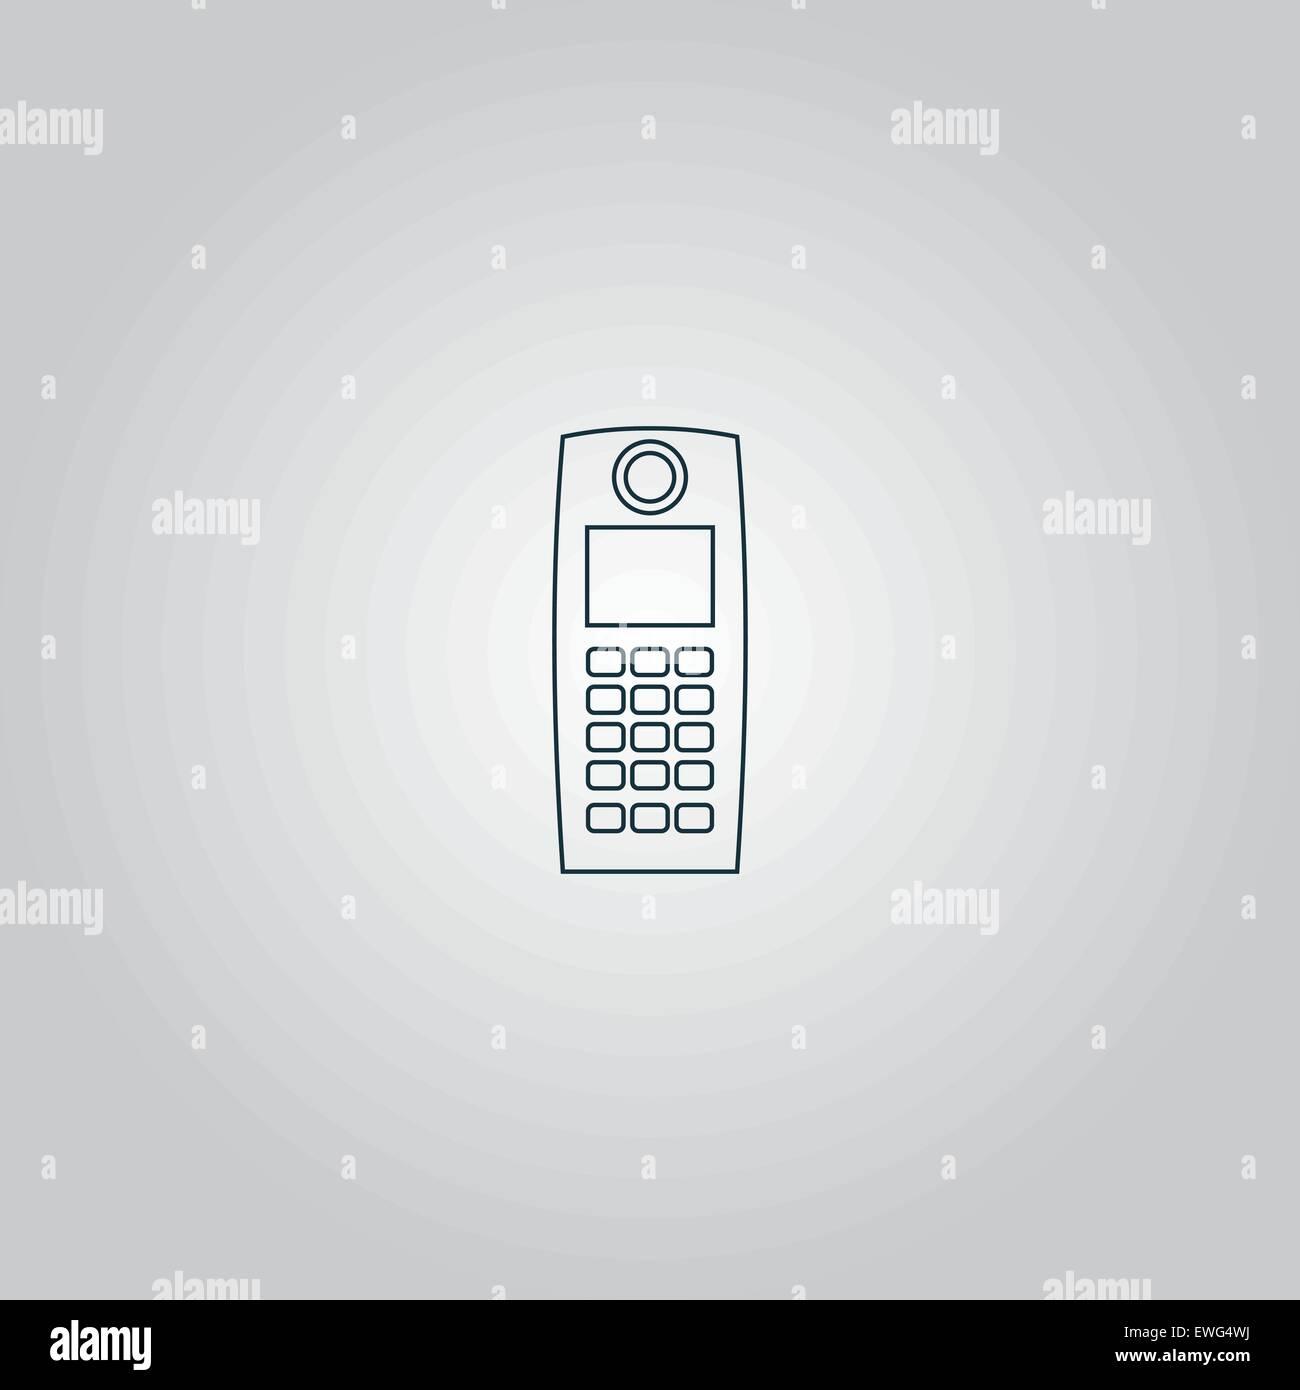 Retro mobile phone icon - Stock Vector